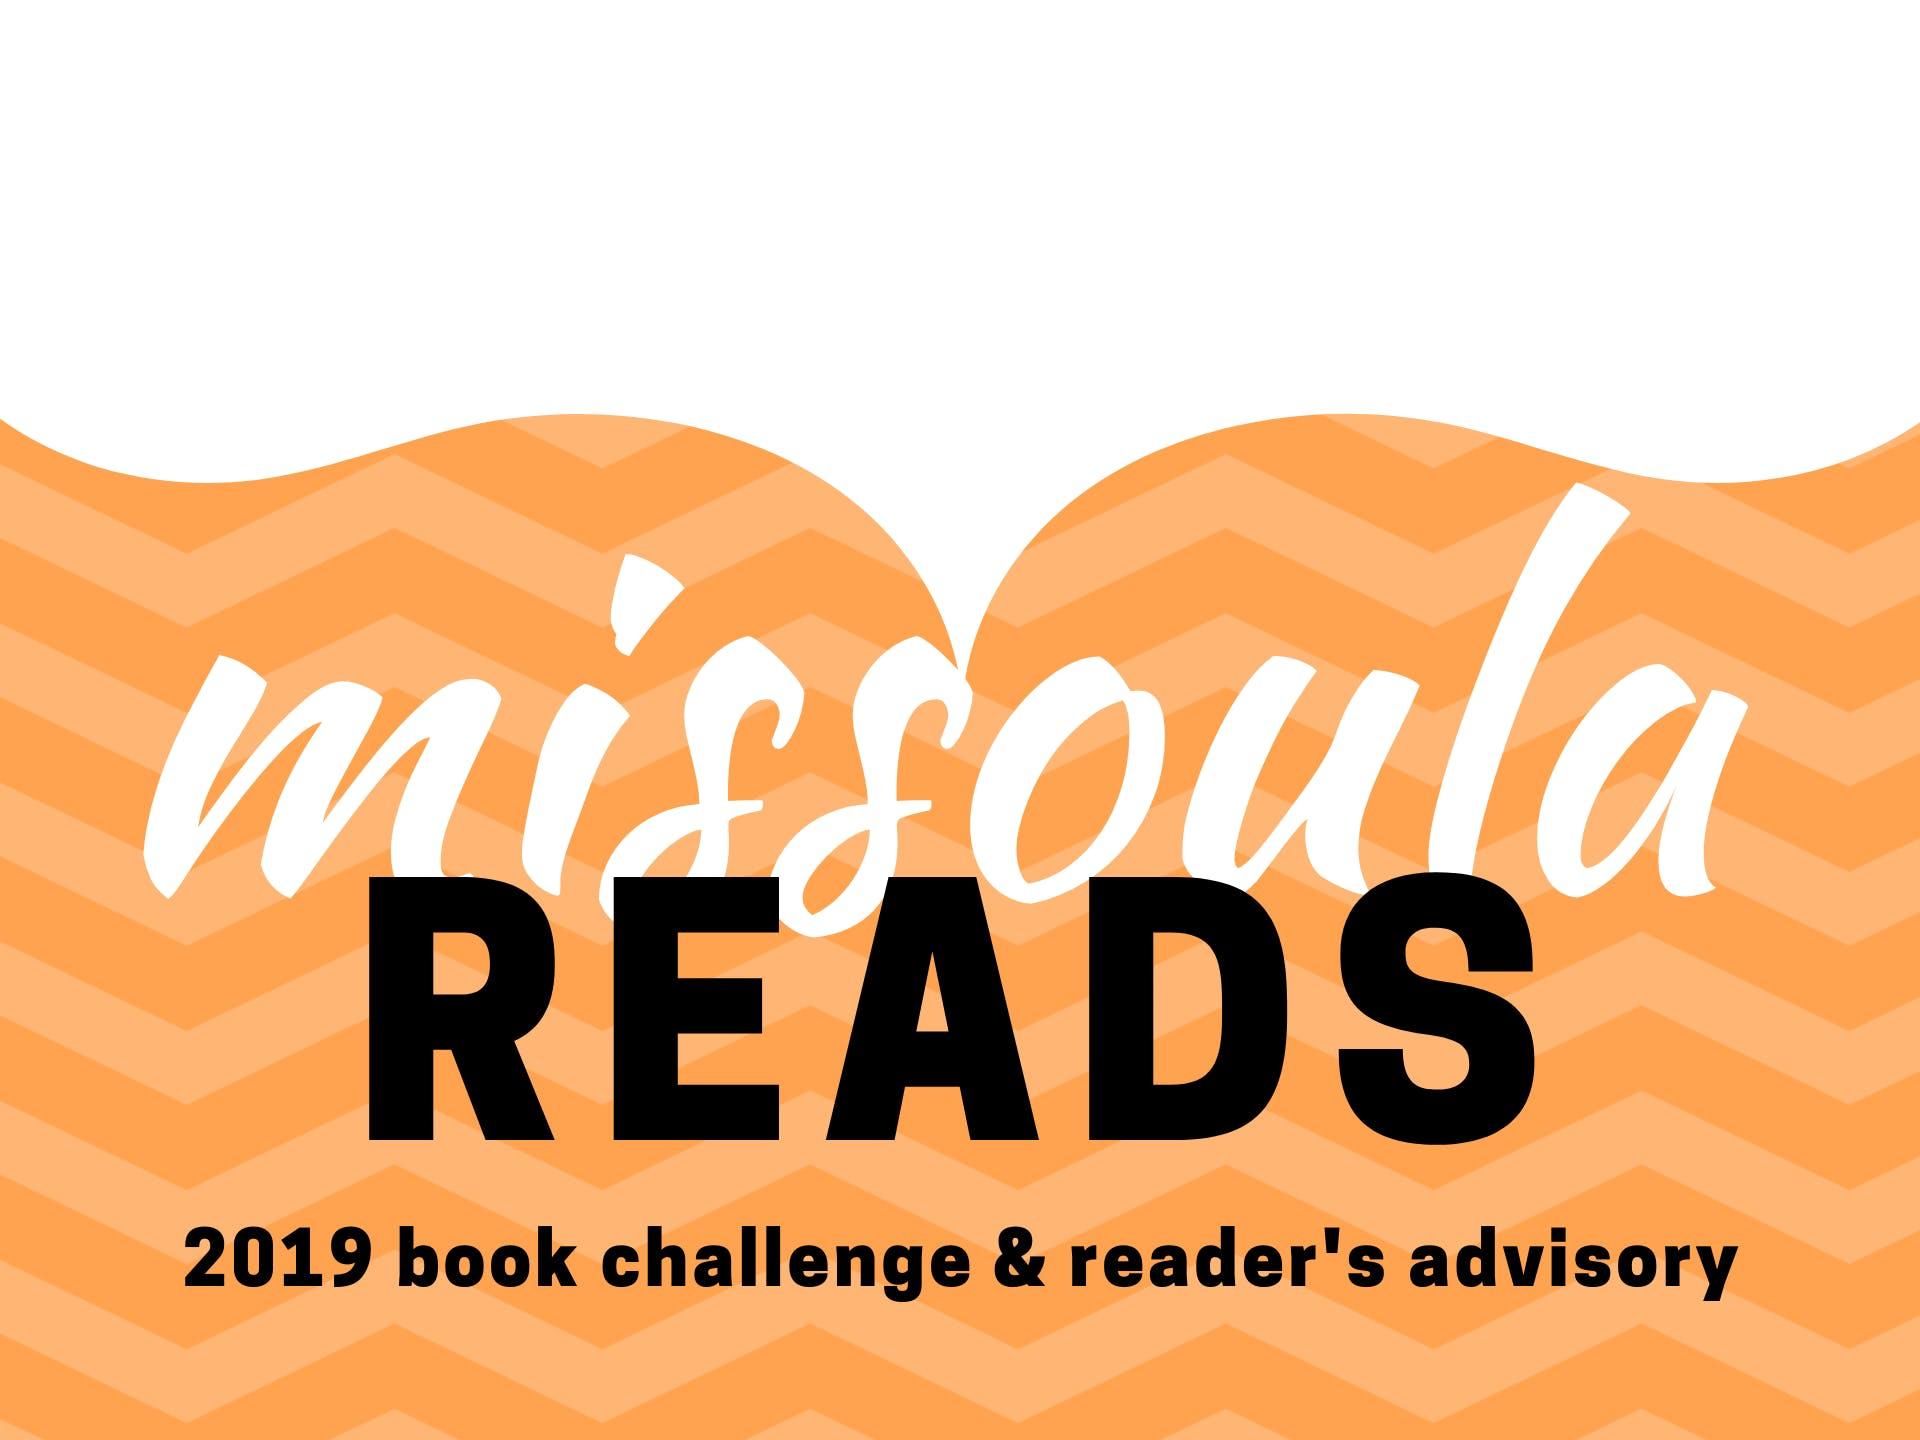 2019 Missoula Reads year-long reading challenge